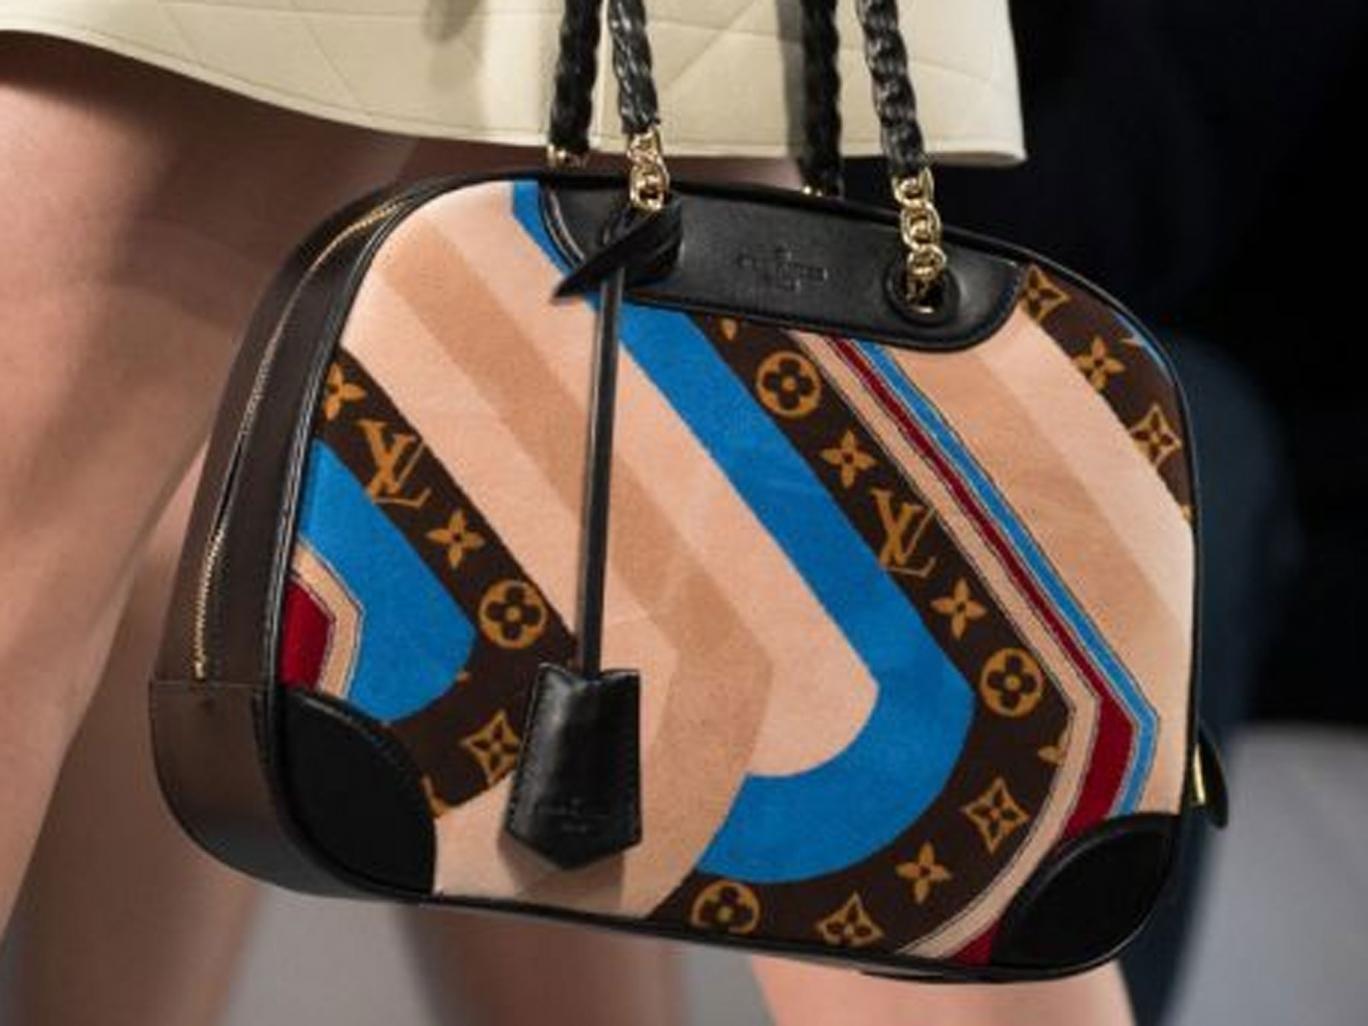 Vuitton's interlaced LV is fashion's most copied fashion logo